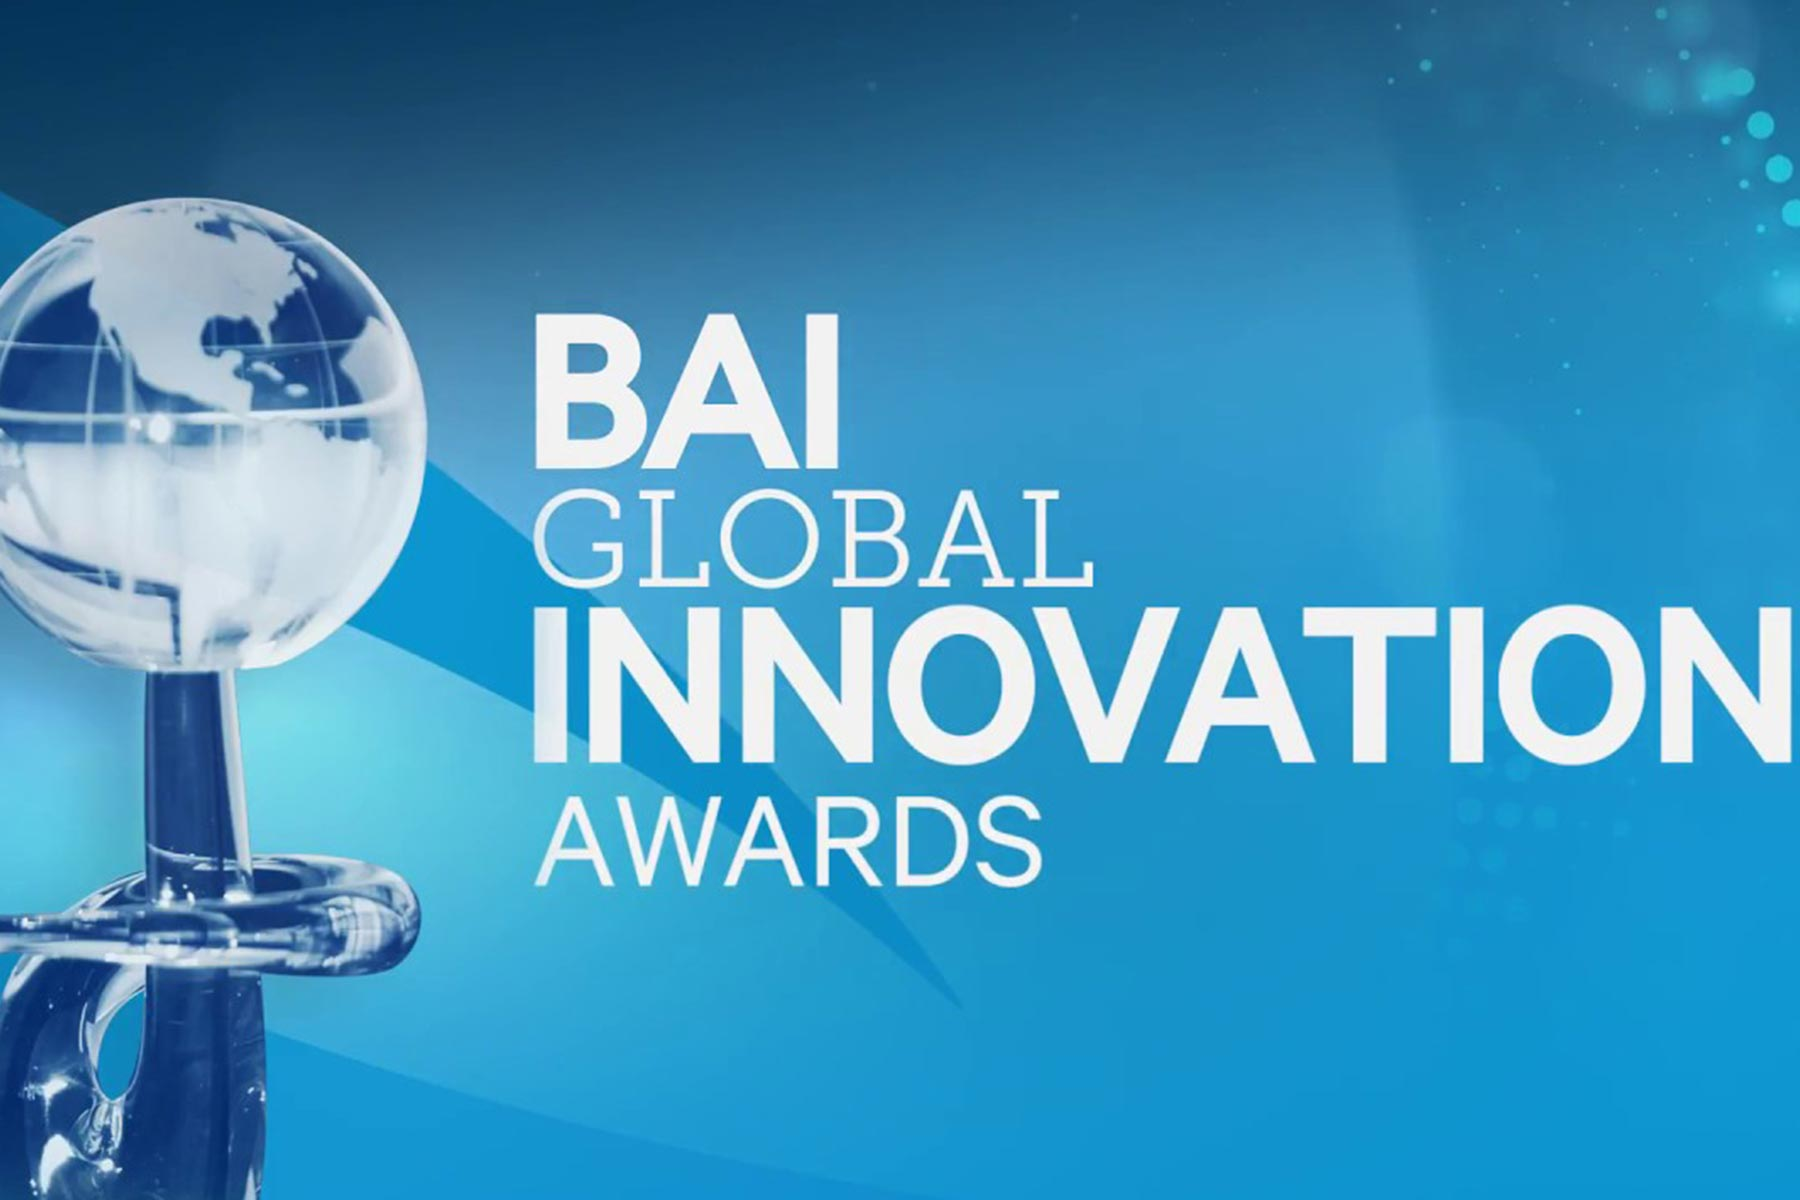 BAI Global Innovation Awards